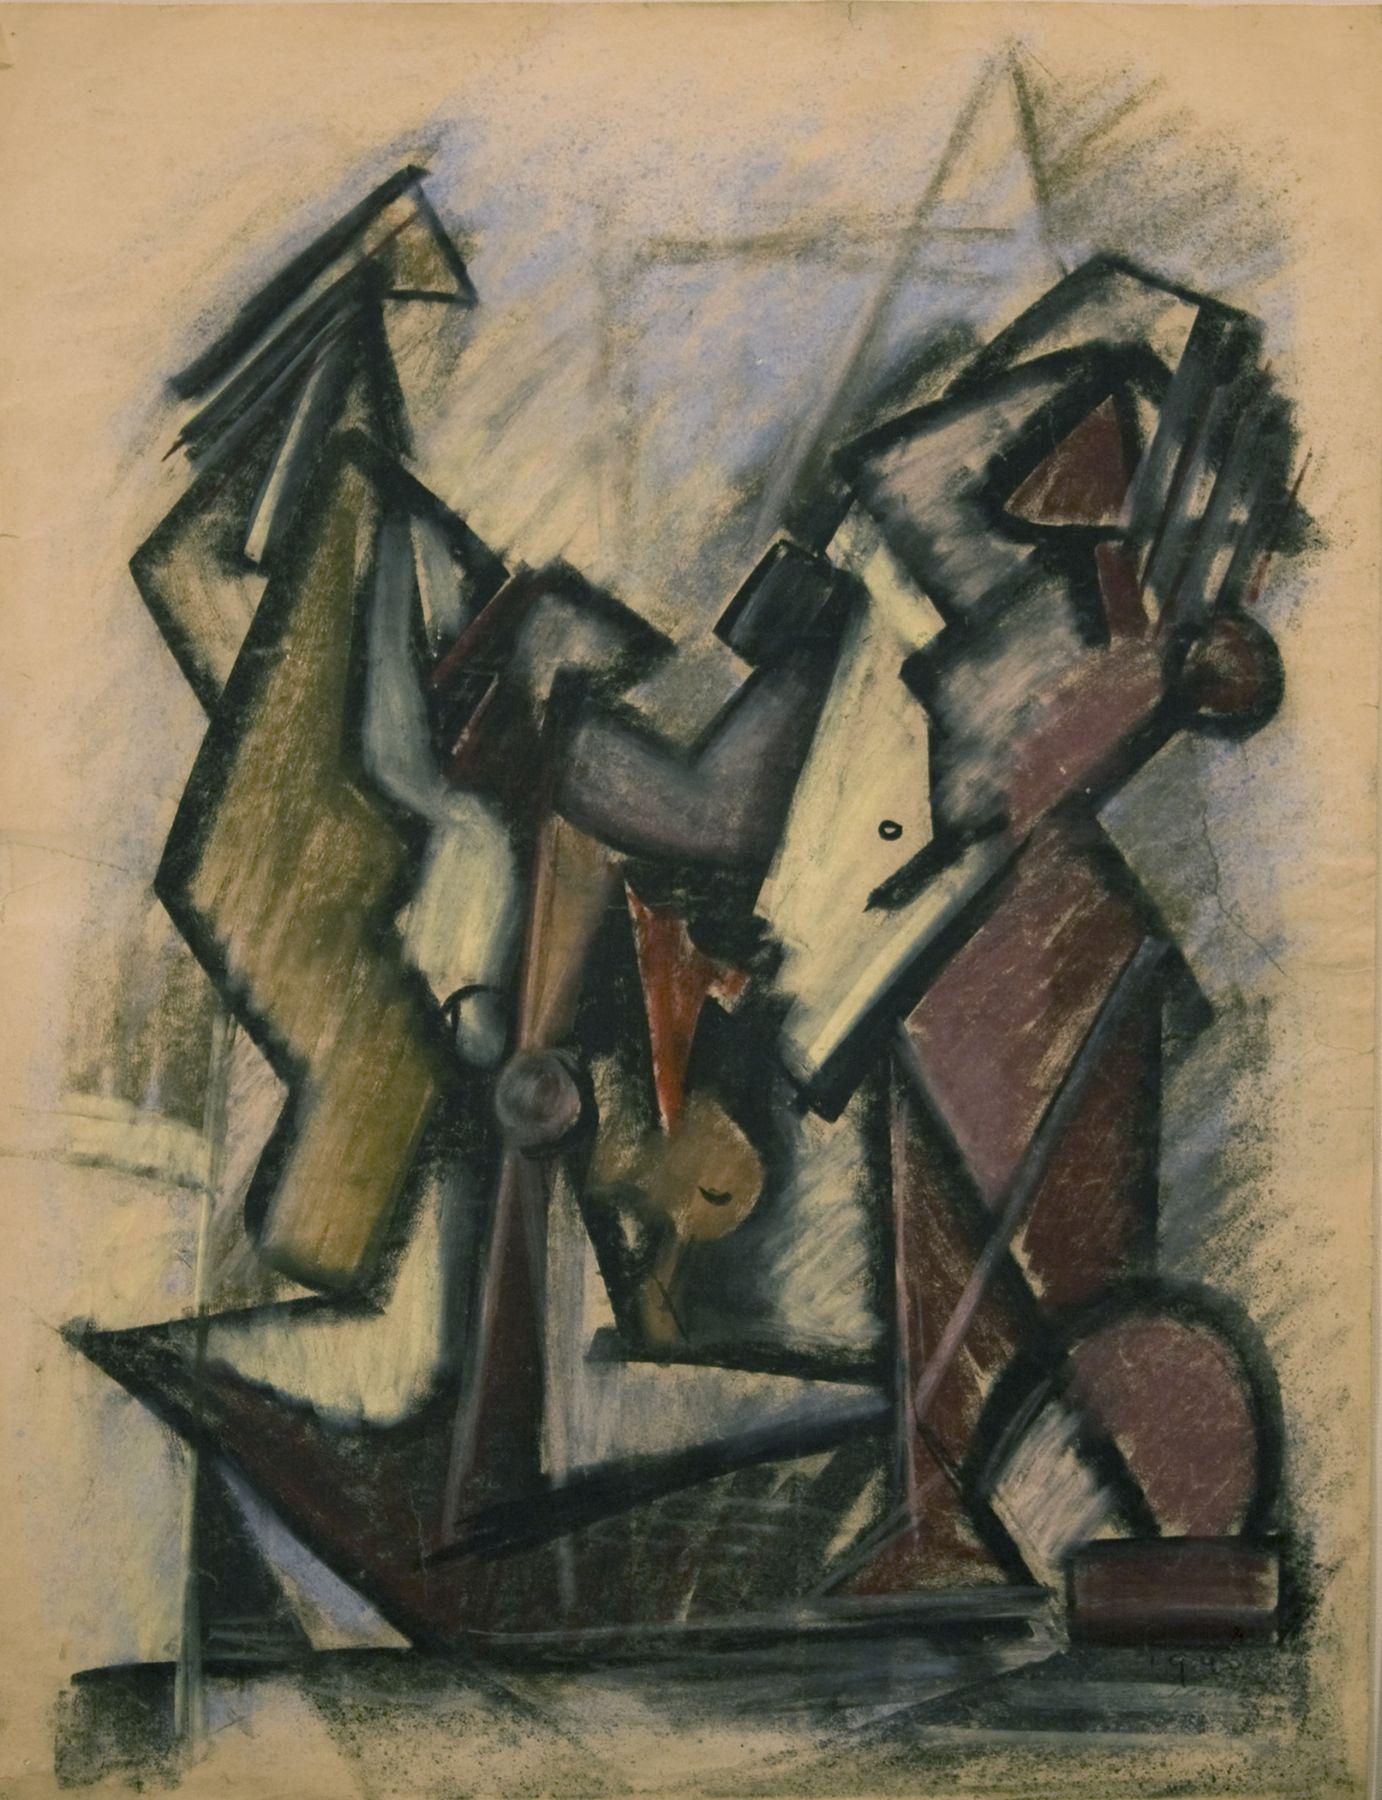 Hans Burkhardt, Untitled, 1940, pastel on paper, 24 1/8 x 18 inches